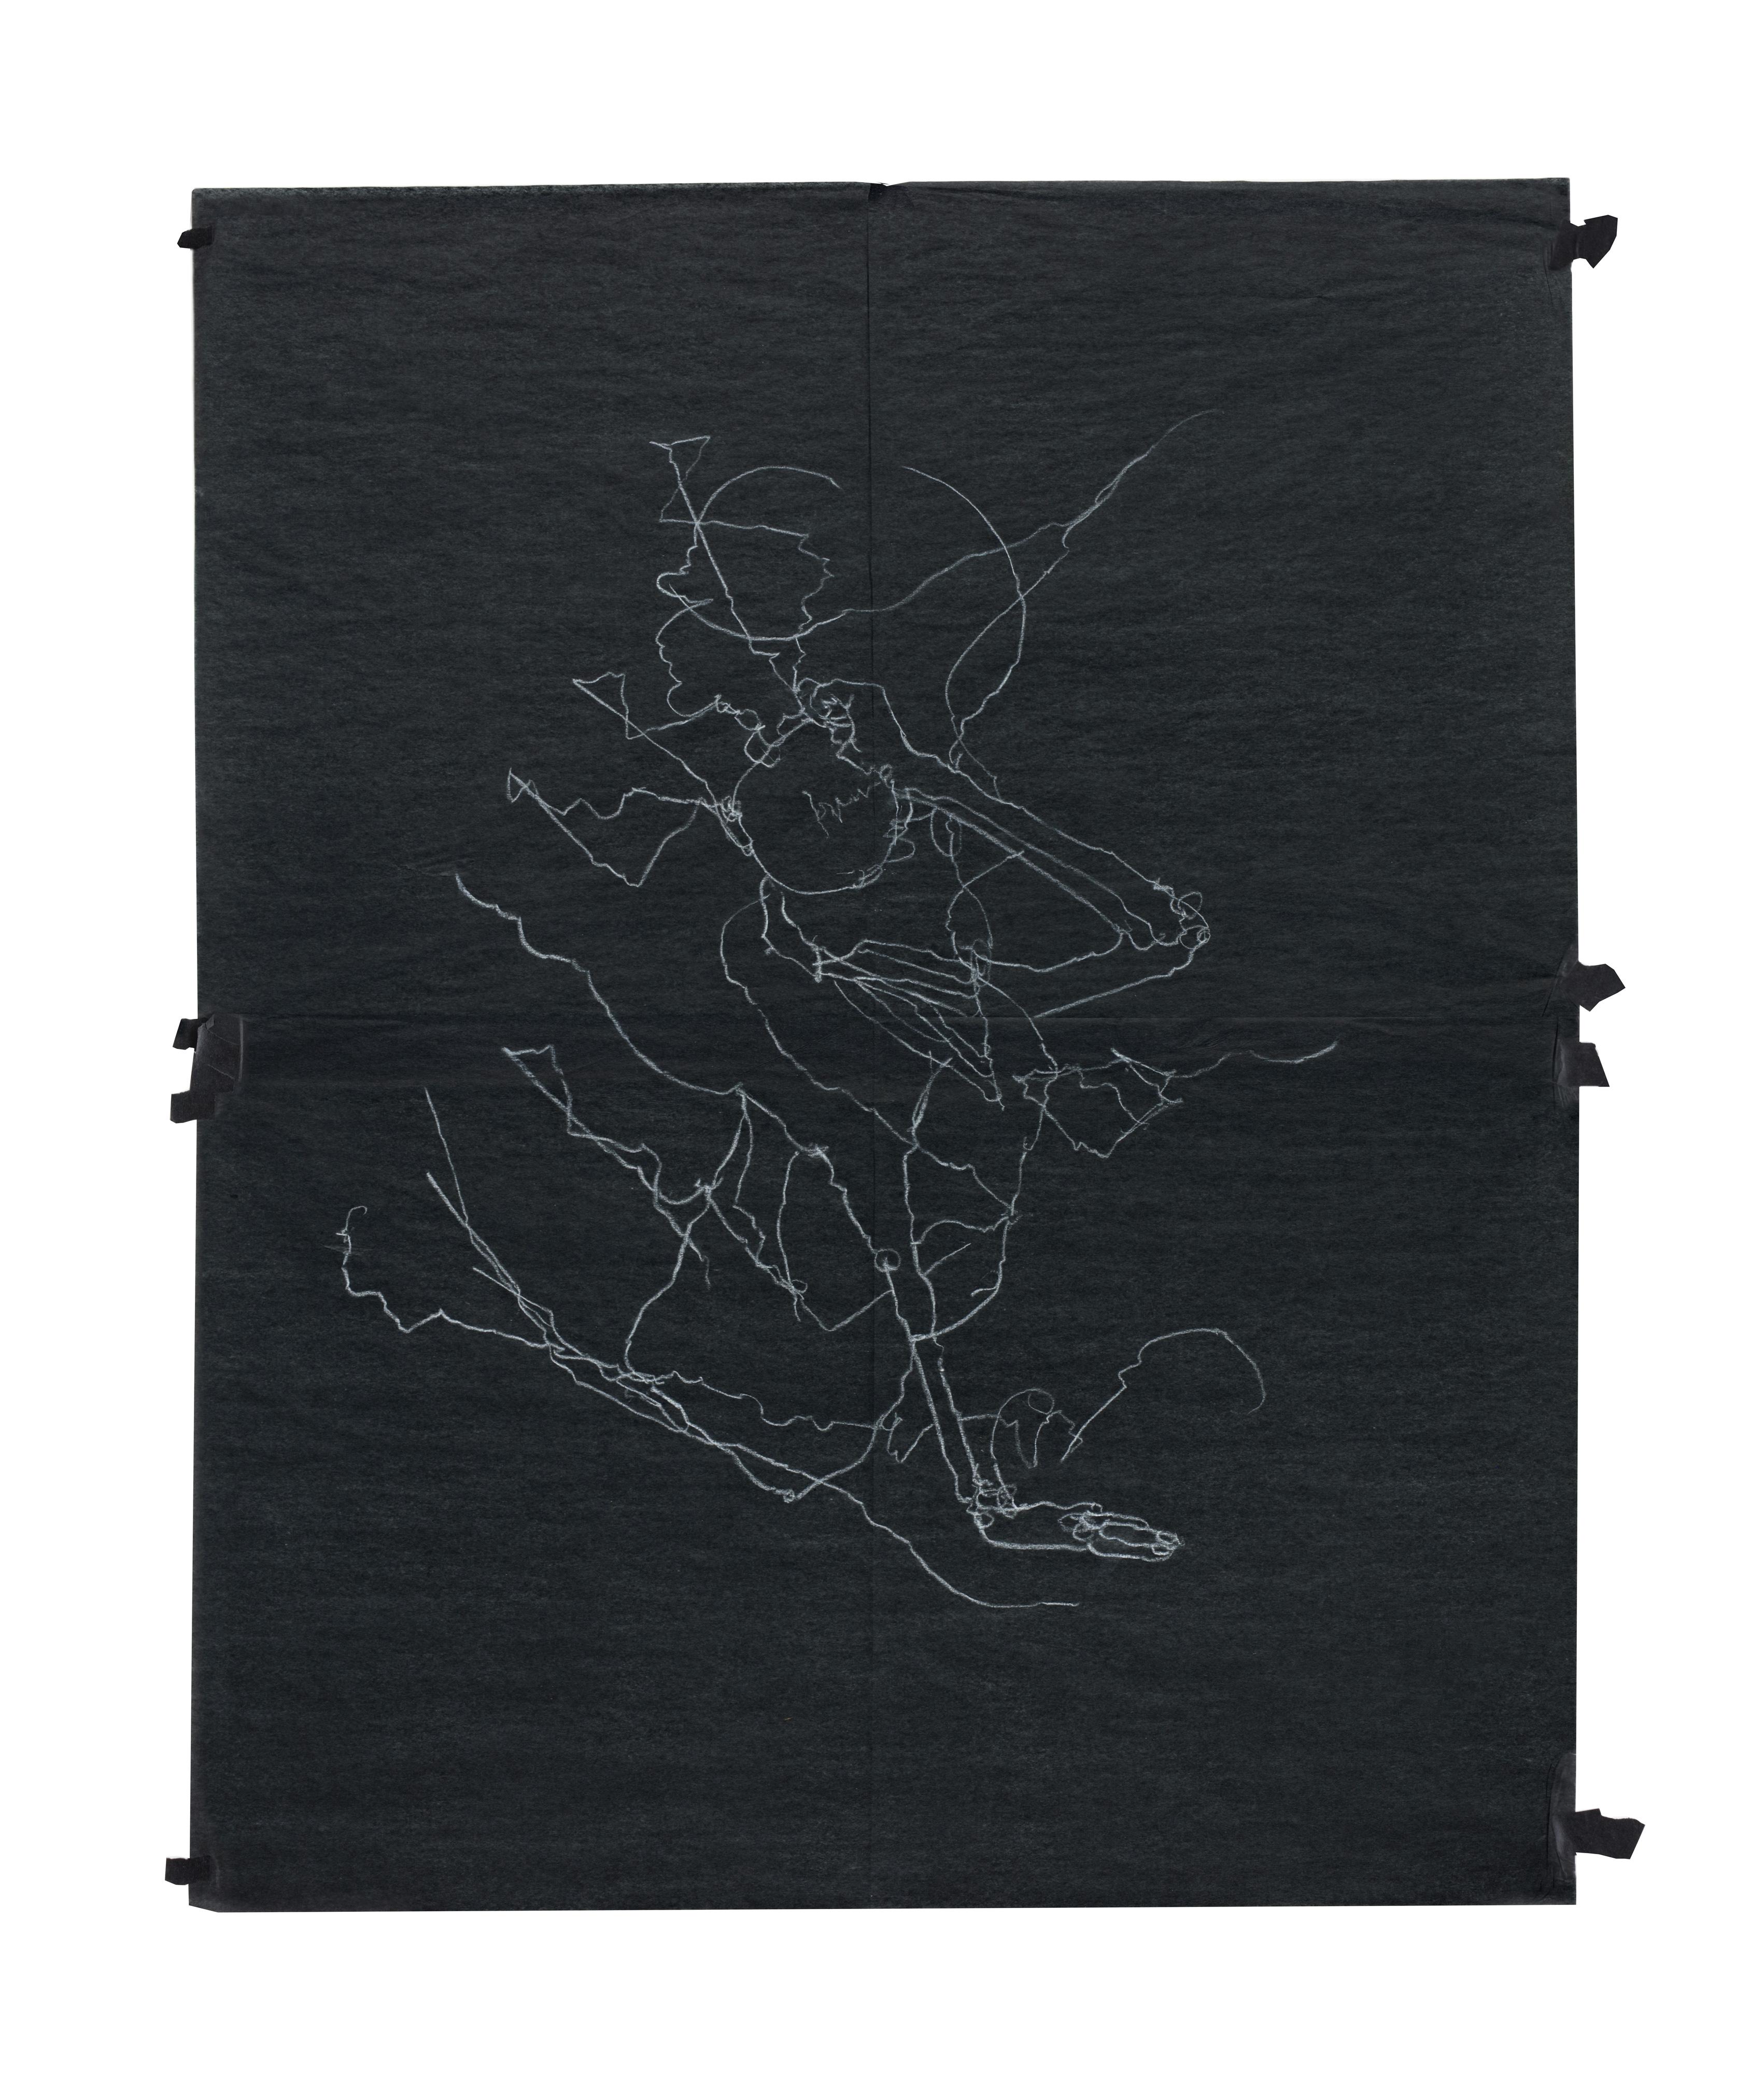 Galerie Barbara Thumm \ New Viewings #11 \ New Viewings #11